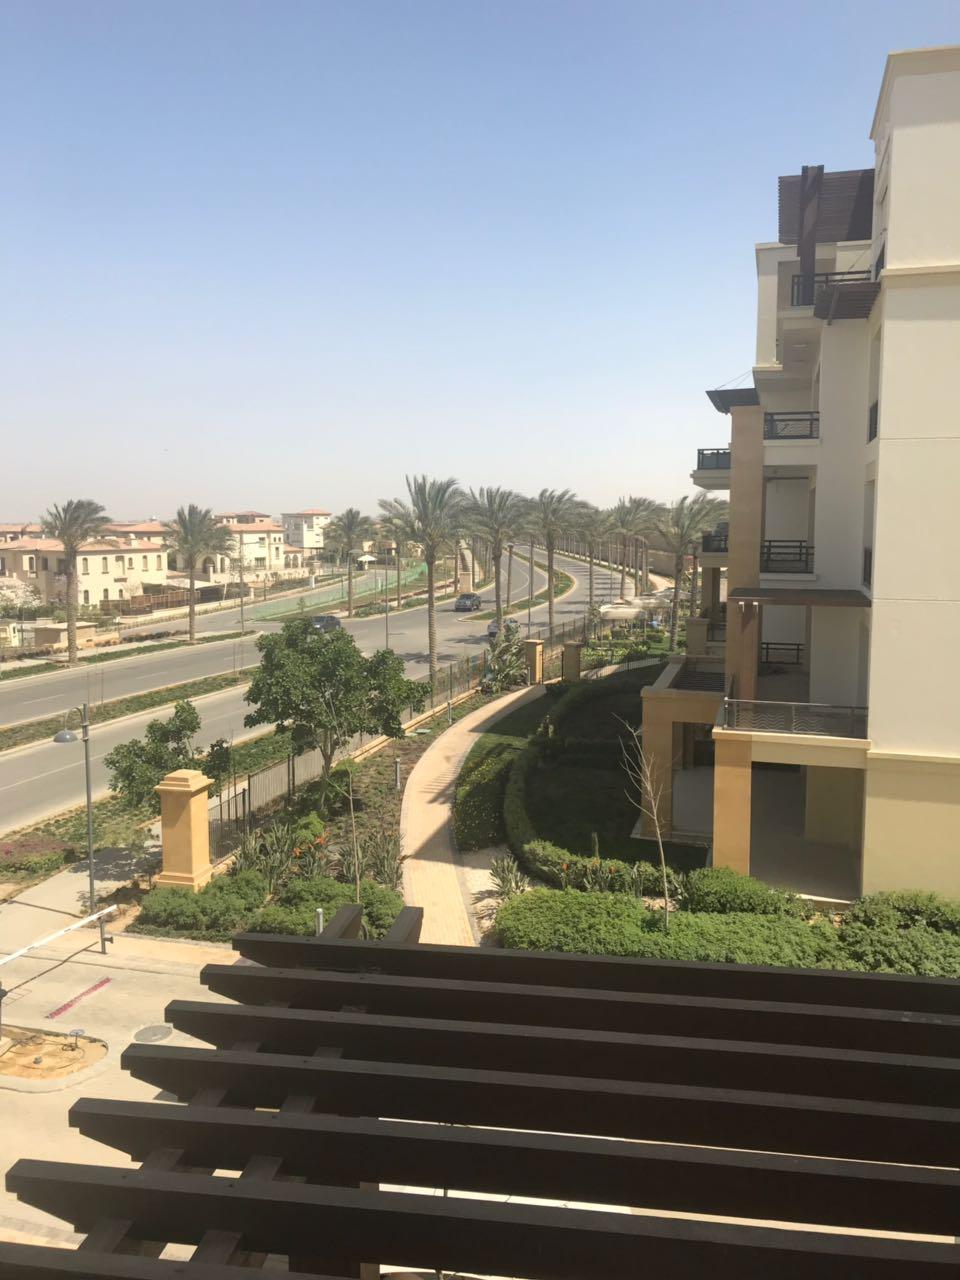 Uptown cairo Apartment 197 m Amazing View